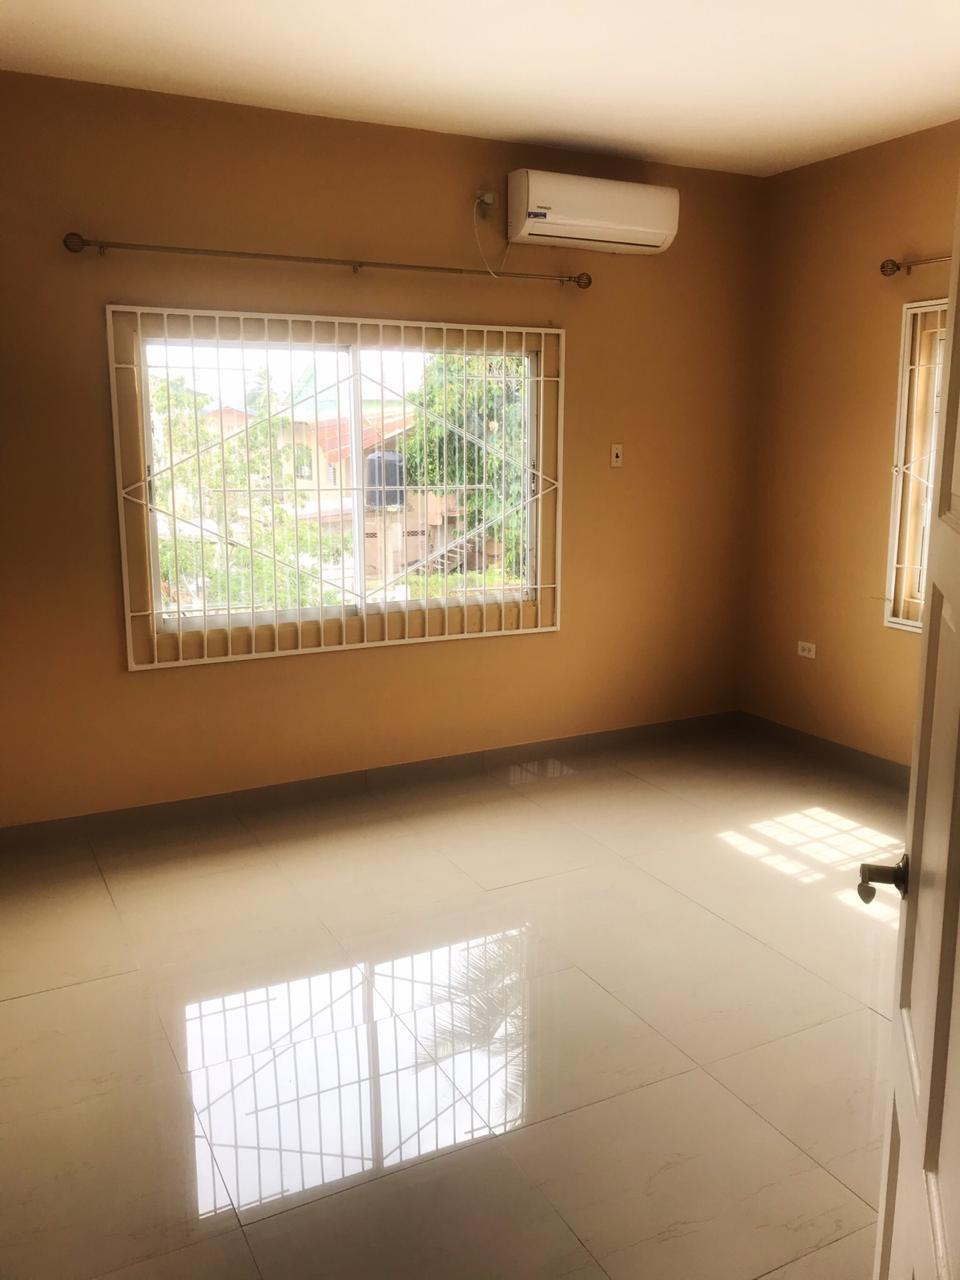 2 Bedroom 2 Bathroom Apartment for Rent - Waterloo Main ...